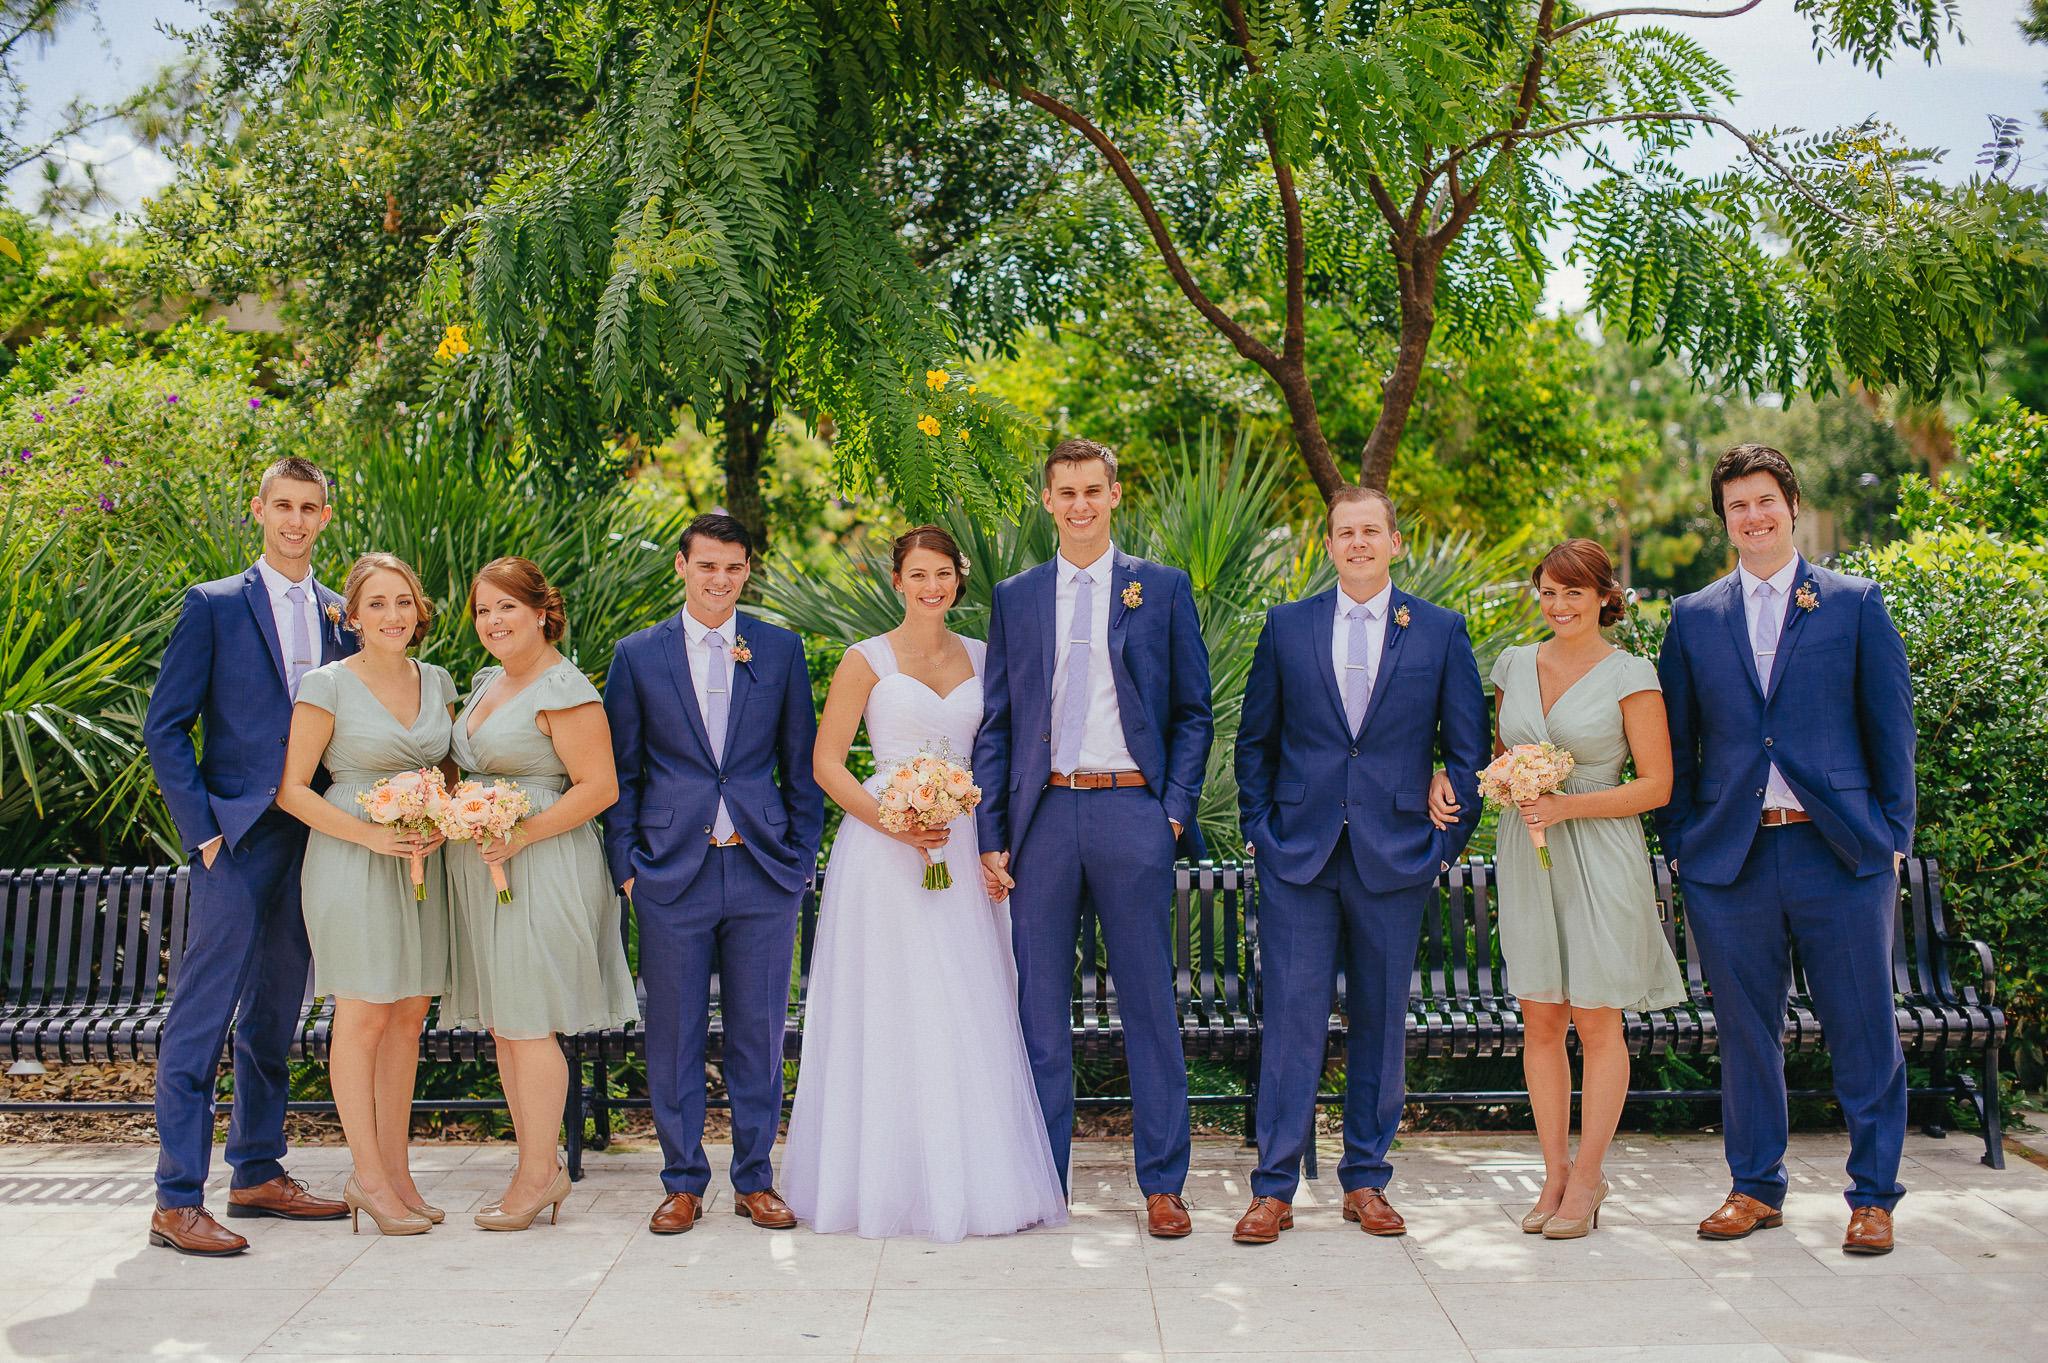 winter park florida wedding party, peach, white, ivory, green, blue wedding attire